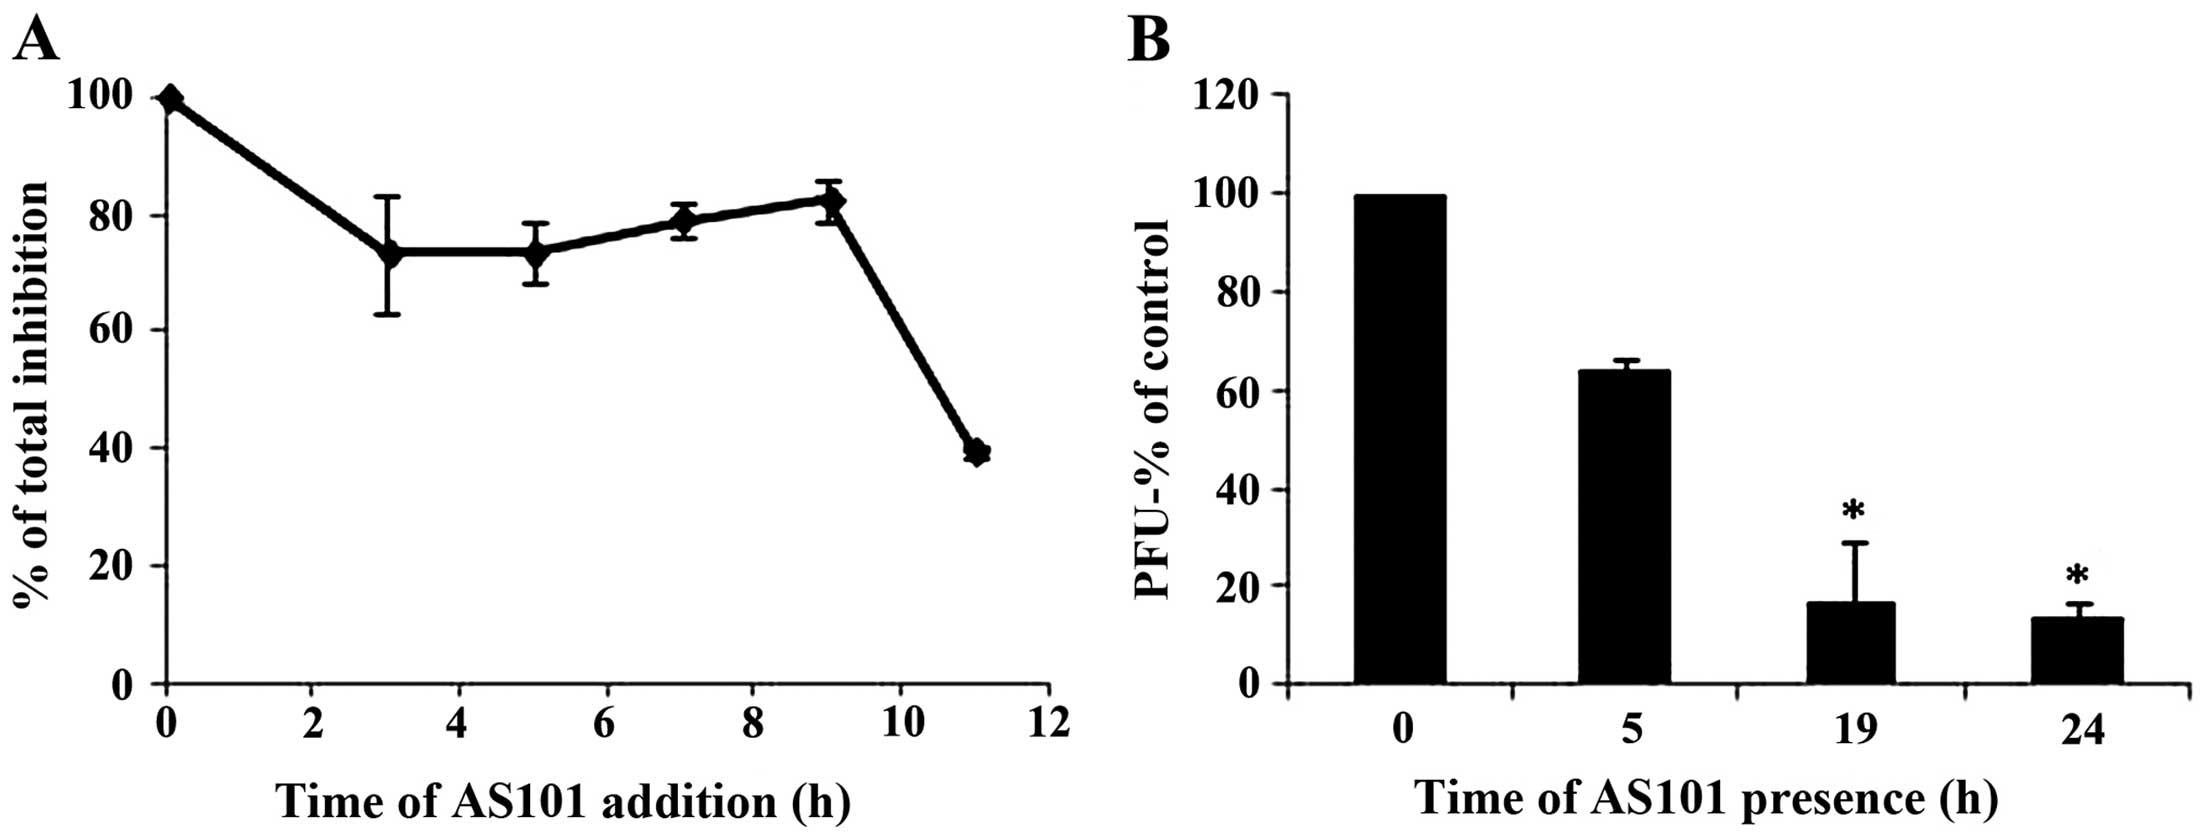 The immunomodulator, ammonium trichloro[1,2-ethanediolato-O,O